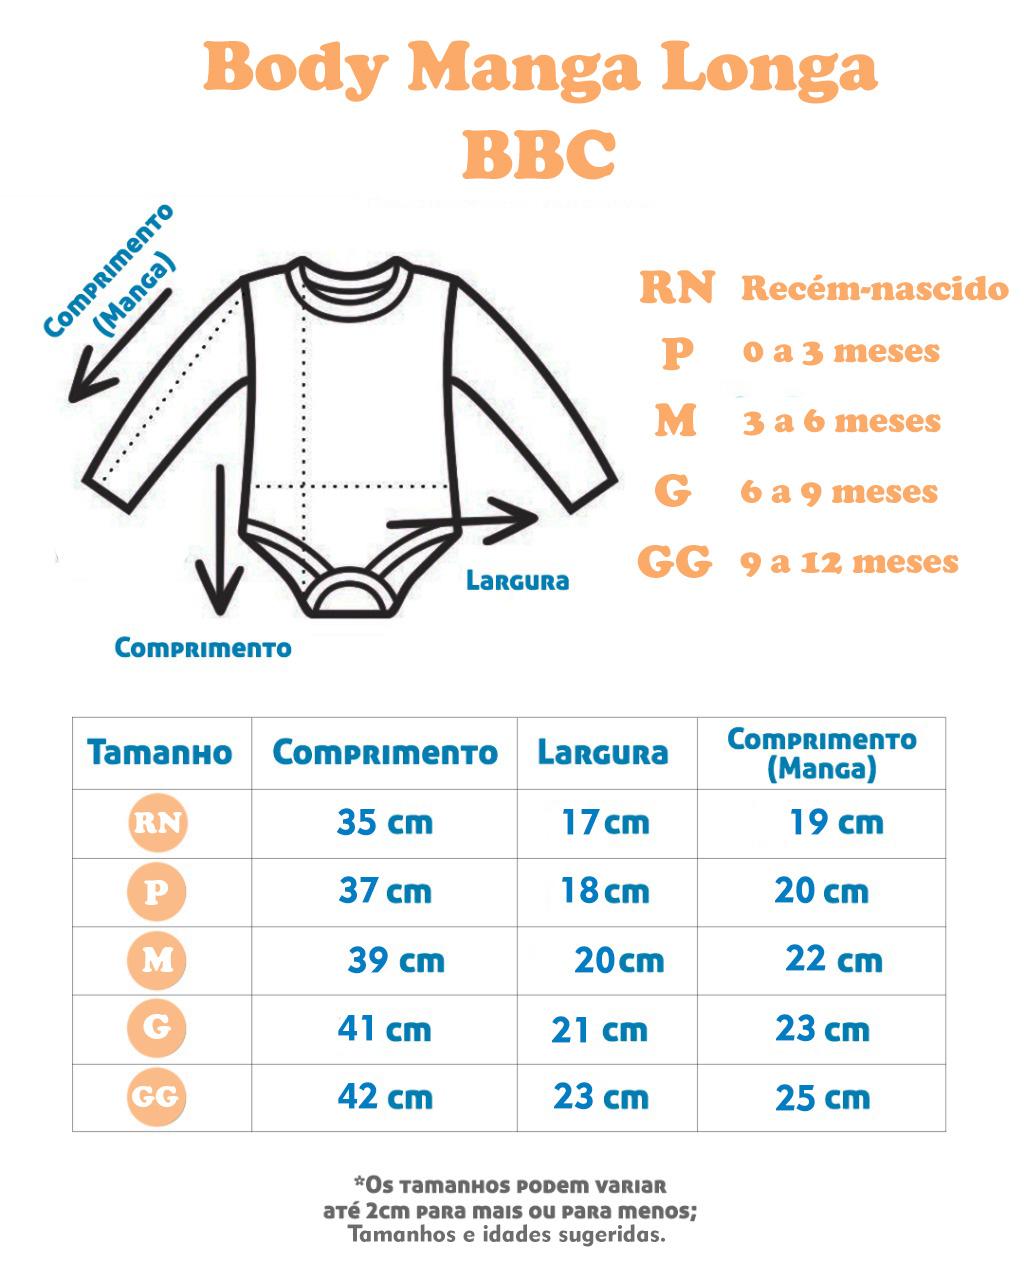 Body Manga Longa Azul Liso (RN/P/M/G/GG)